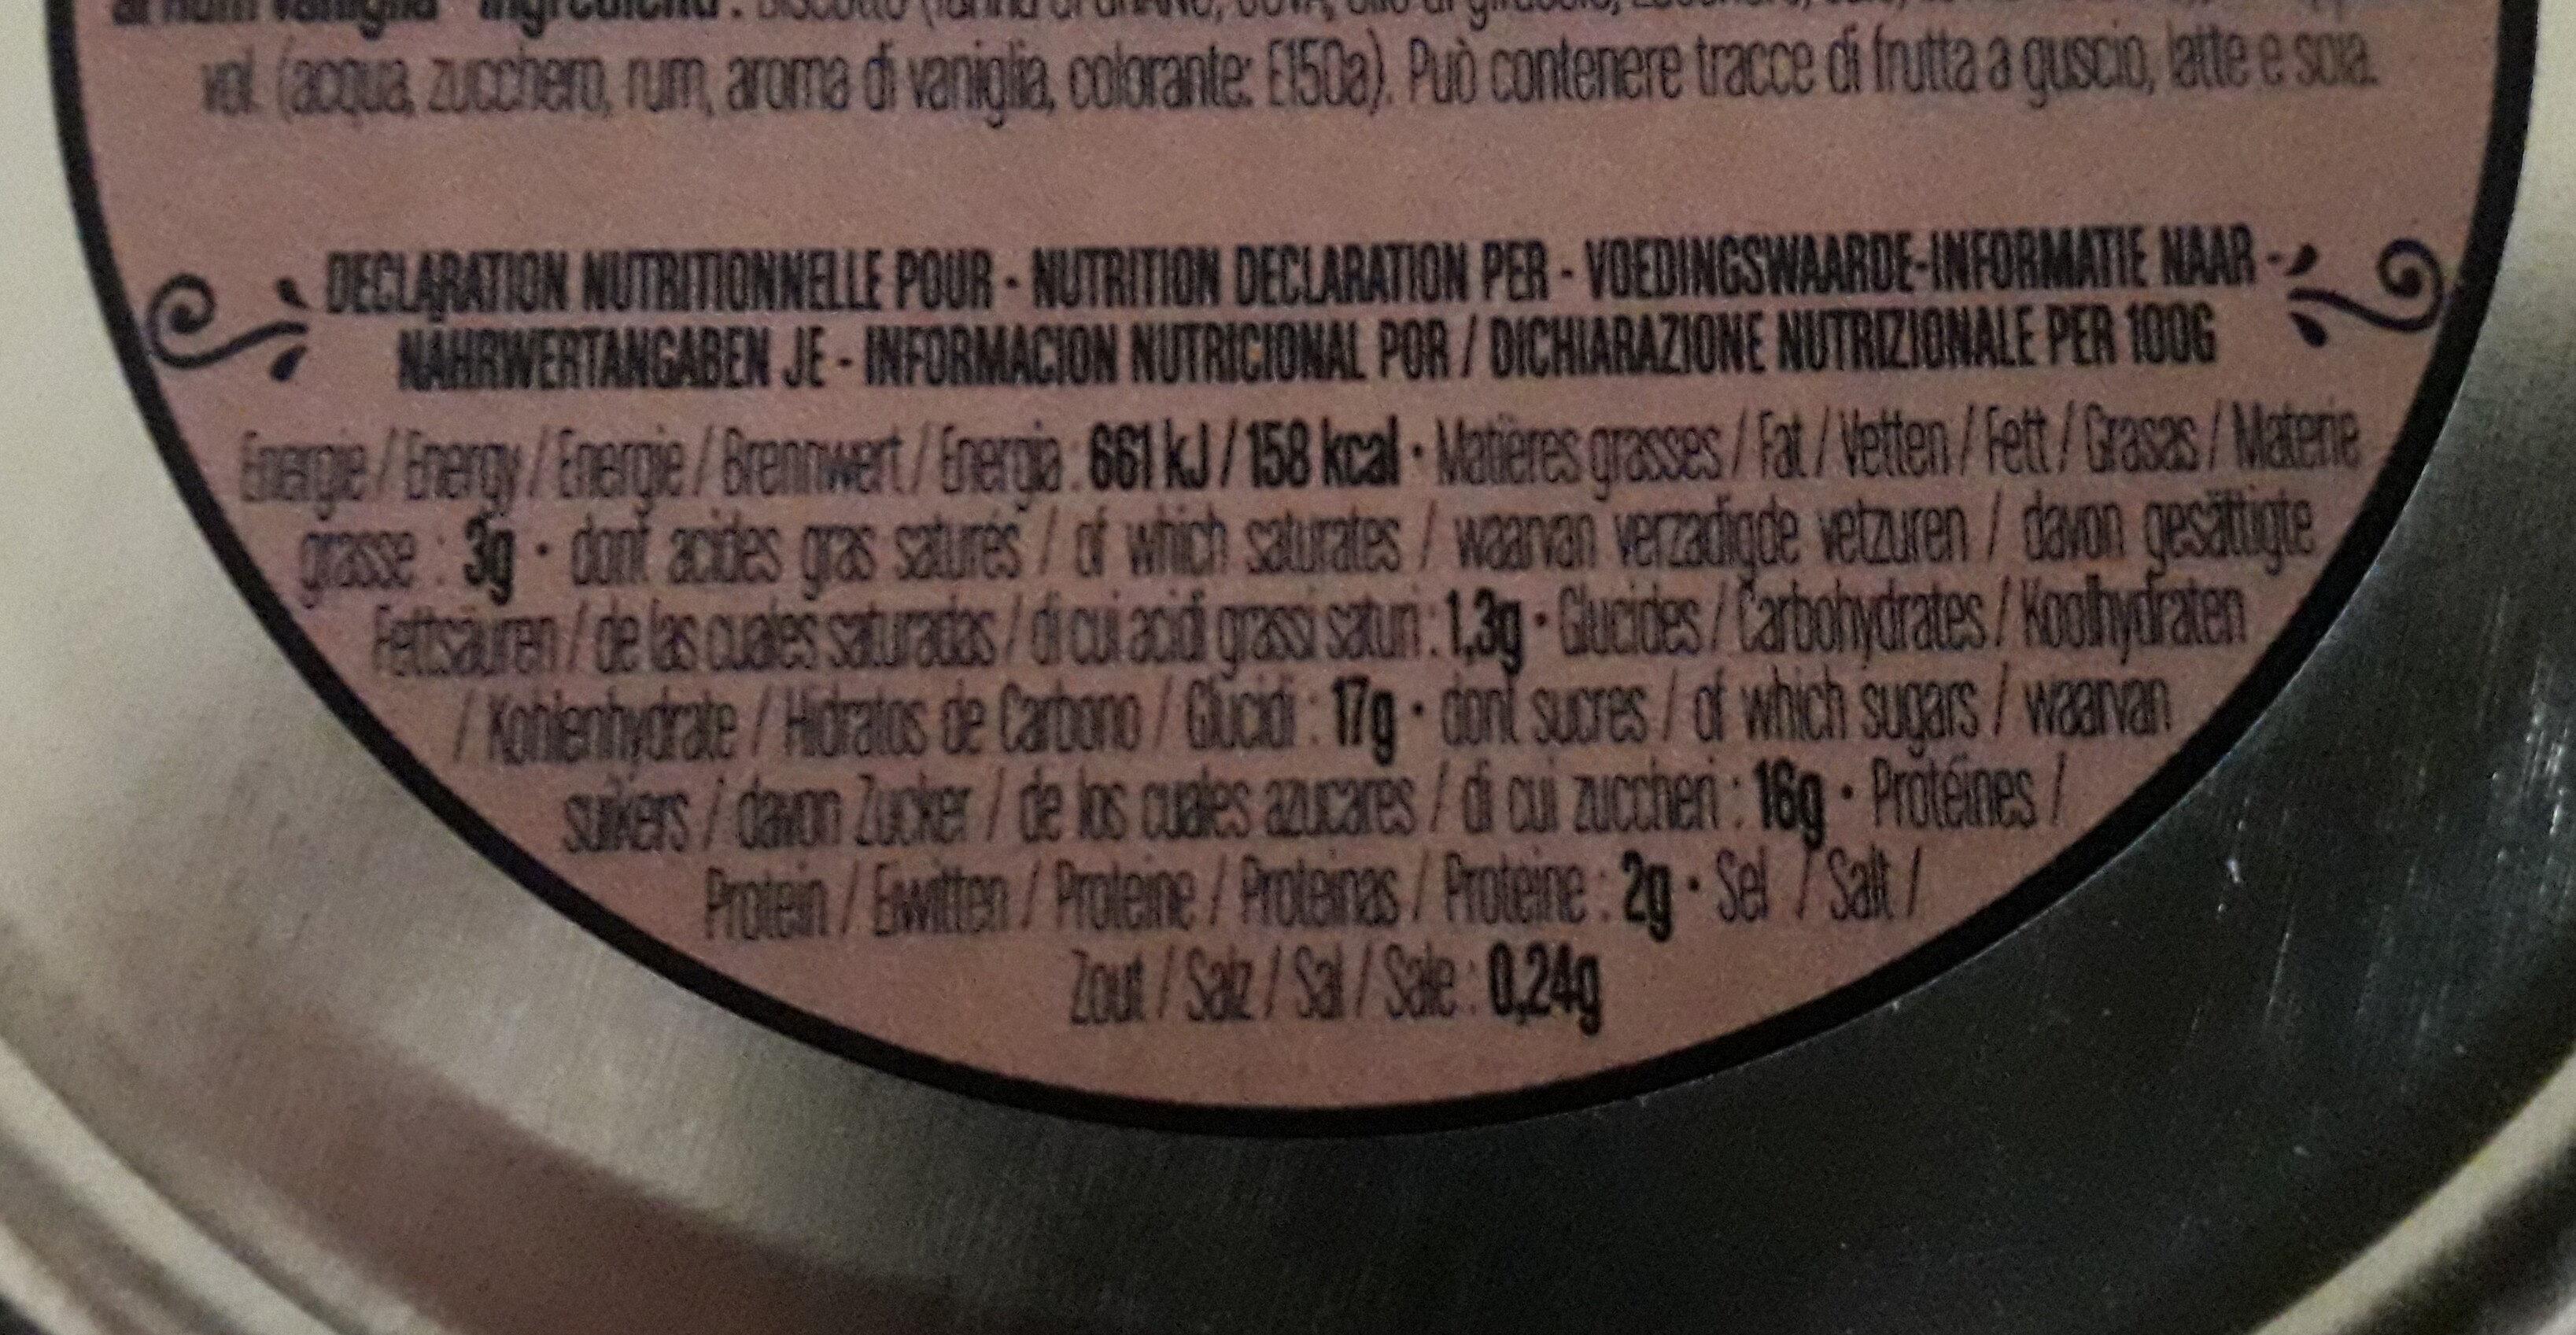 Baba au rhum vanille - Informations nutritionnelles - fr